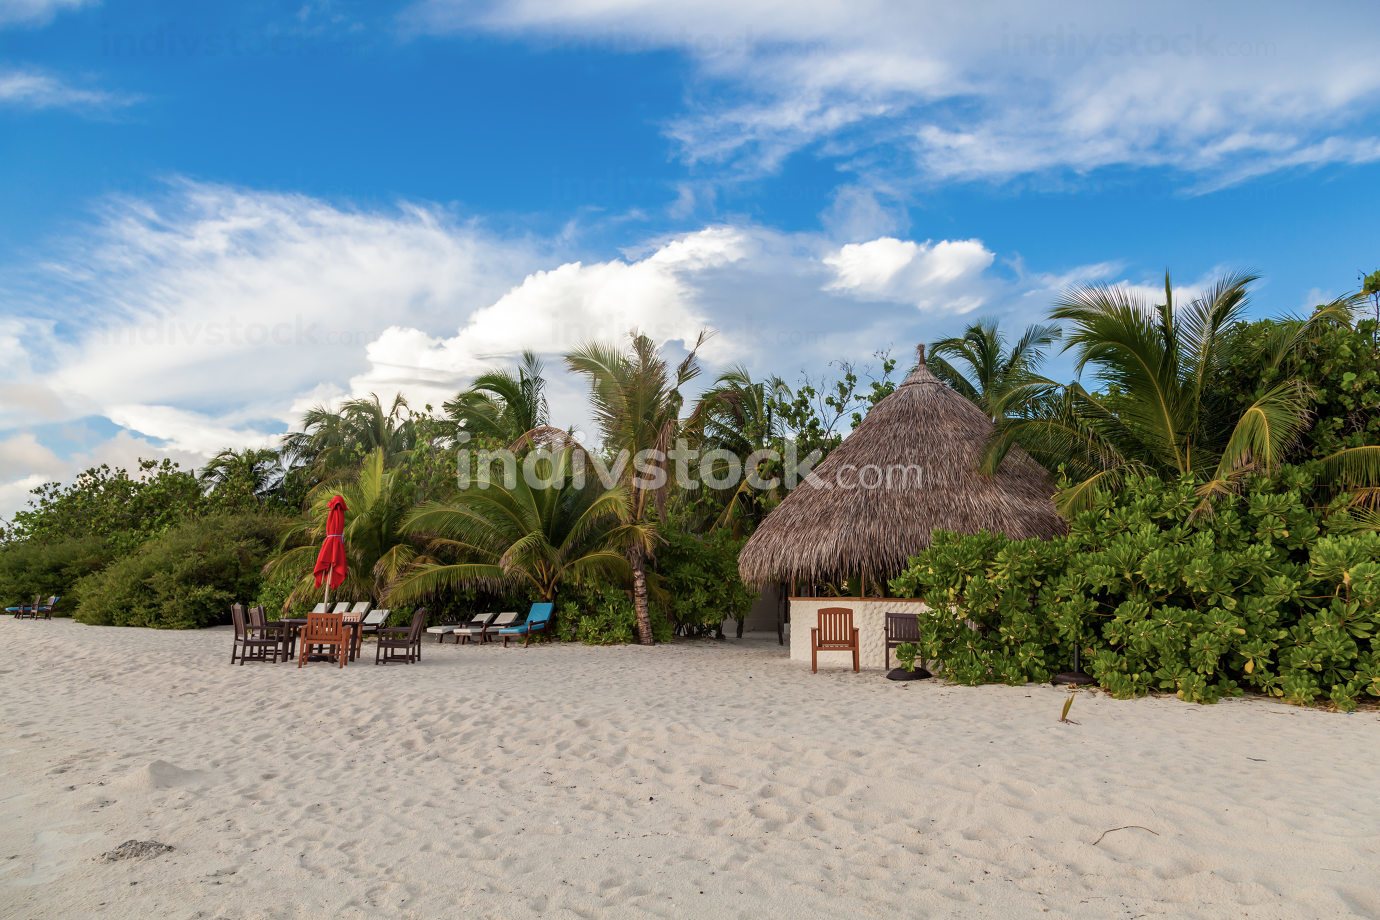 Maldives, tropical paradise, small bar on the beach